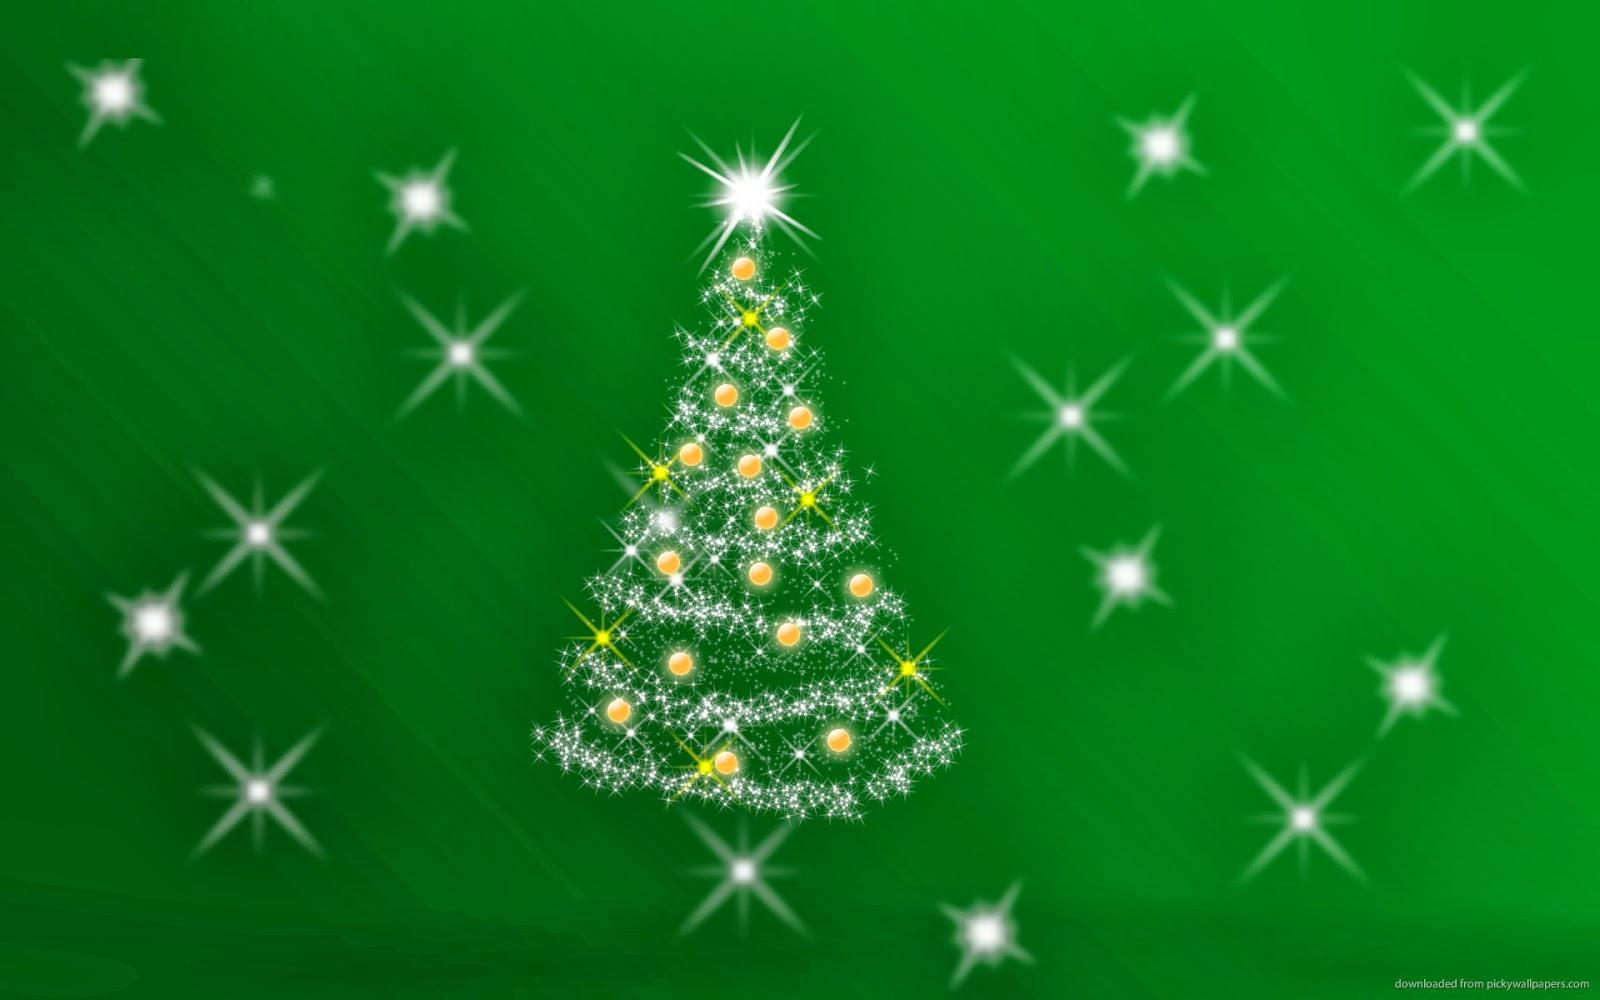 Green Christmas Background HD Wallpaper | All Wallpaper ...